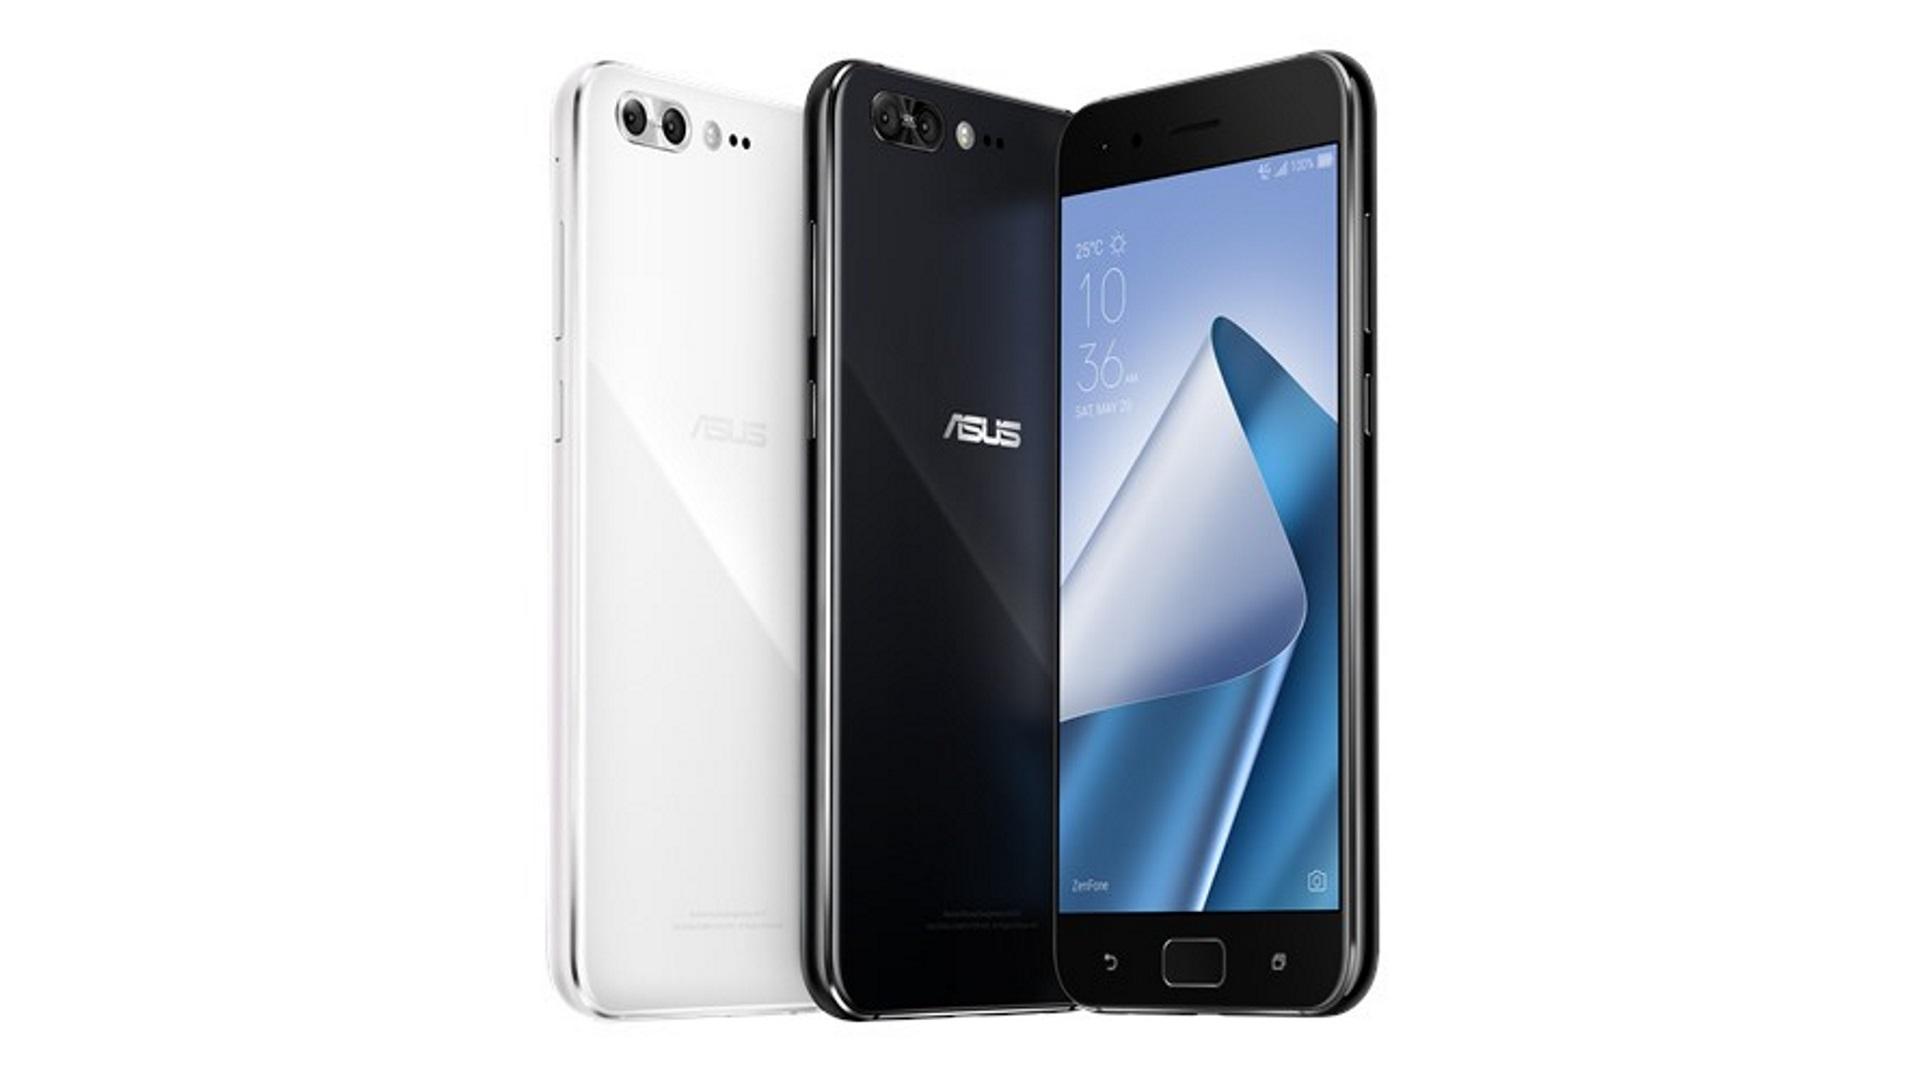 「ASUS ZenFone 4 Pro」は10月27日に発売